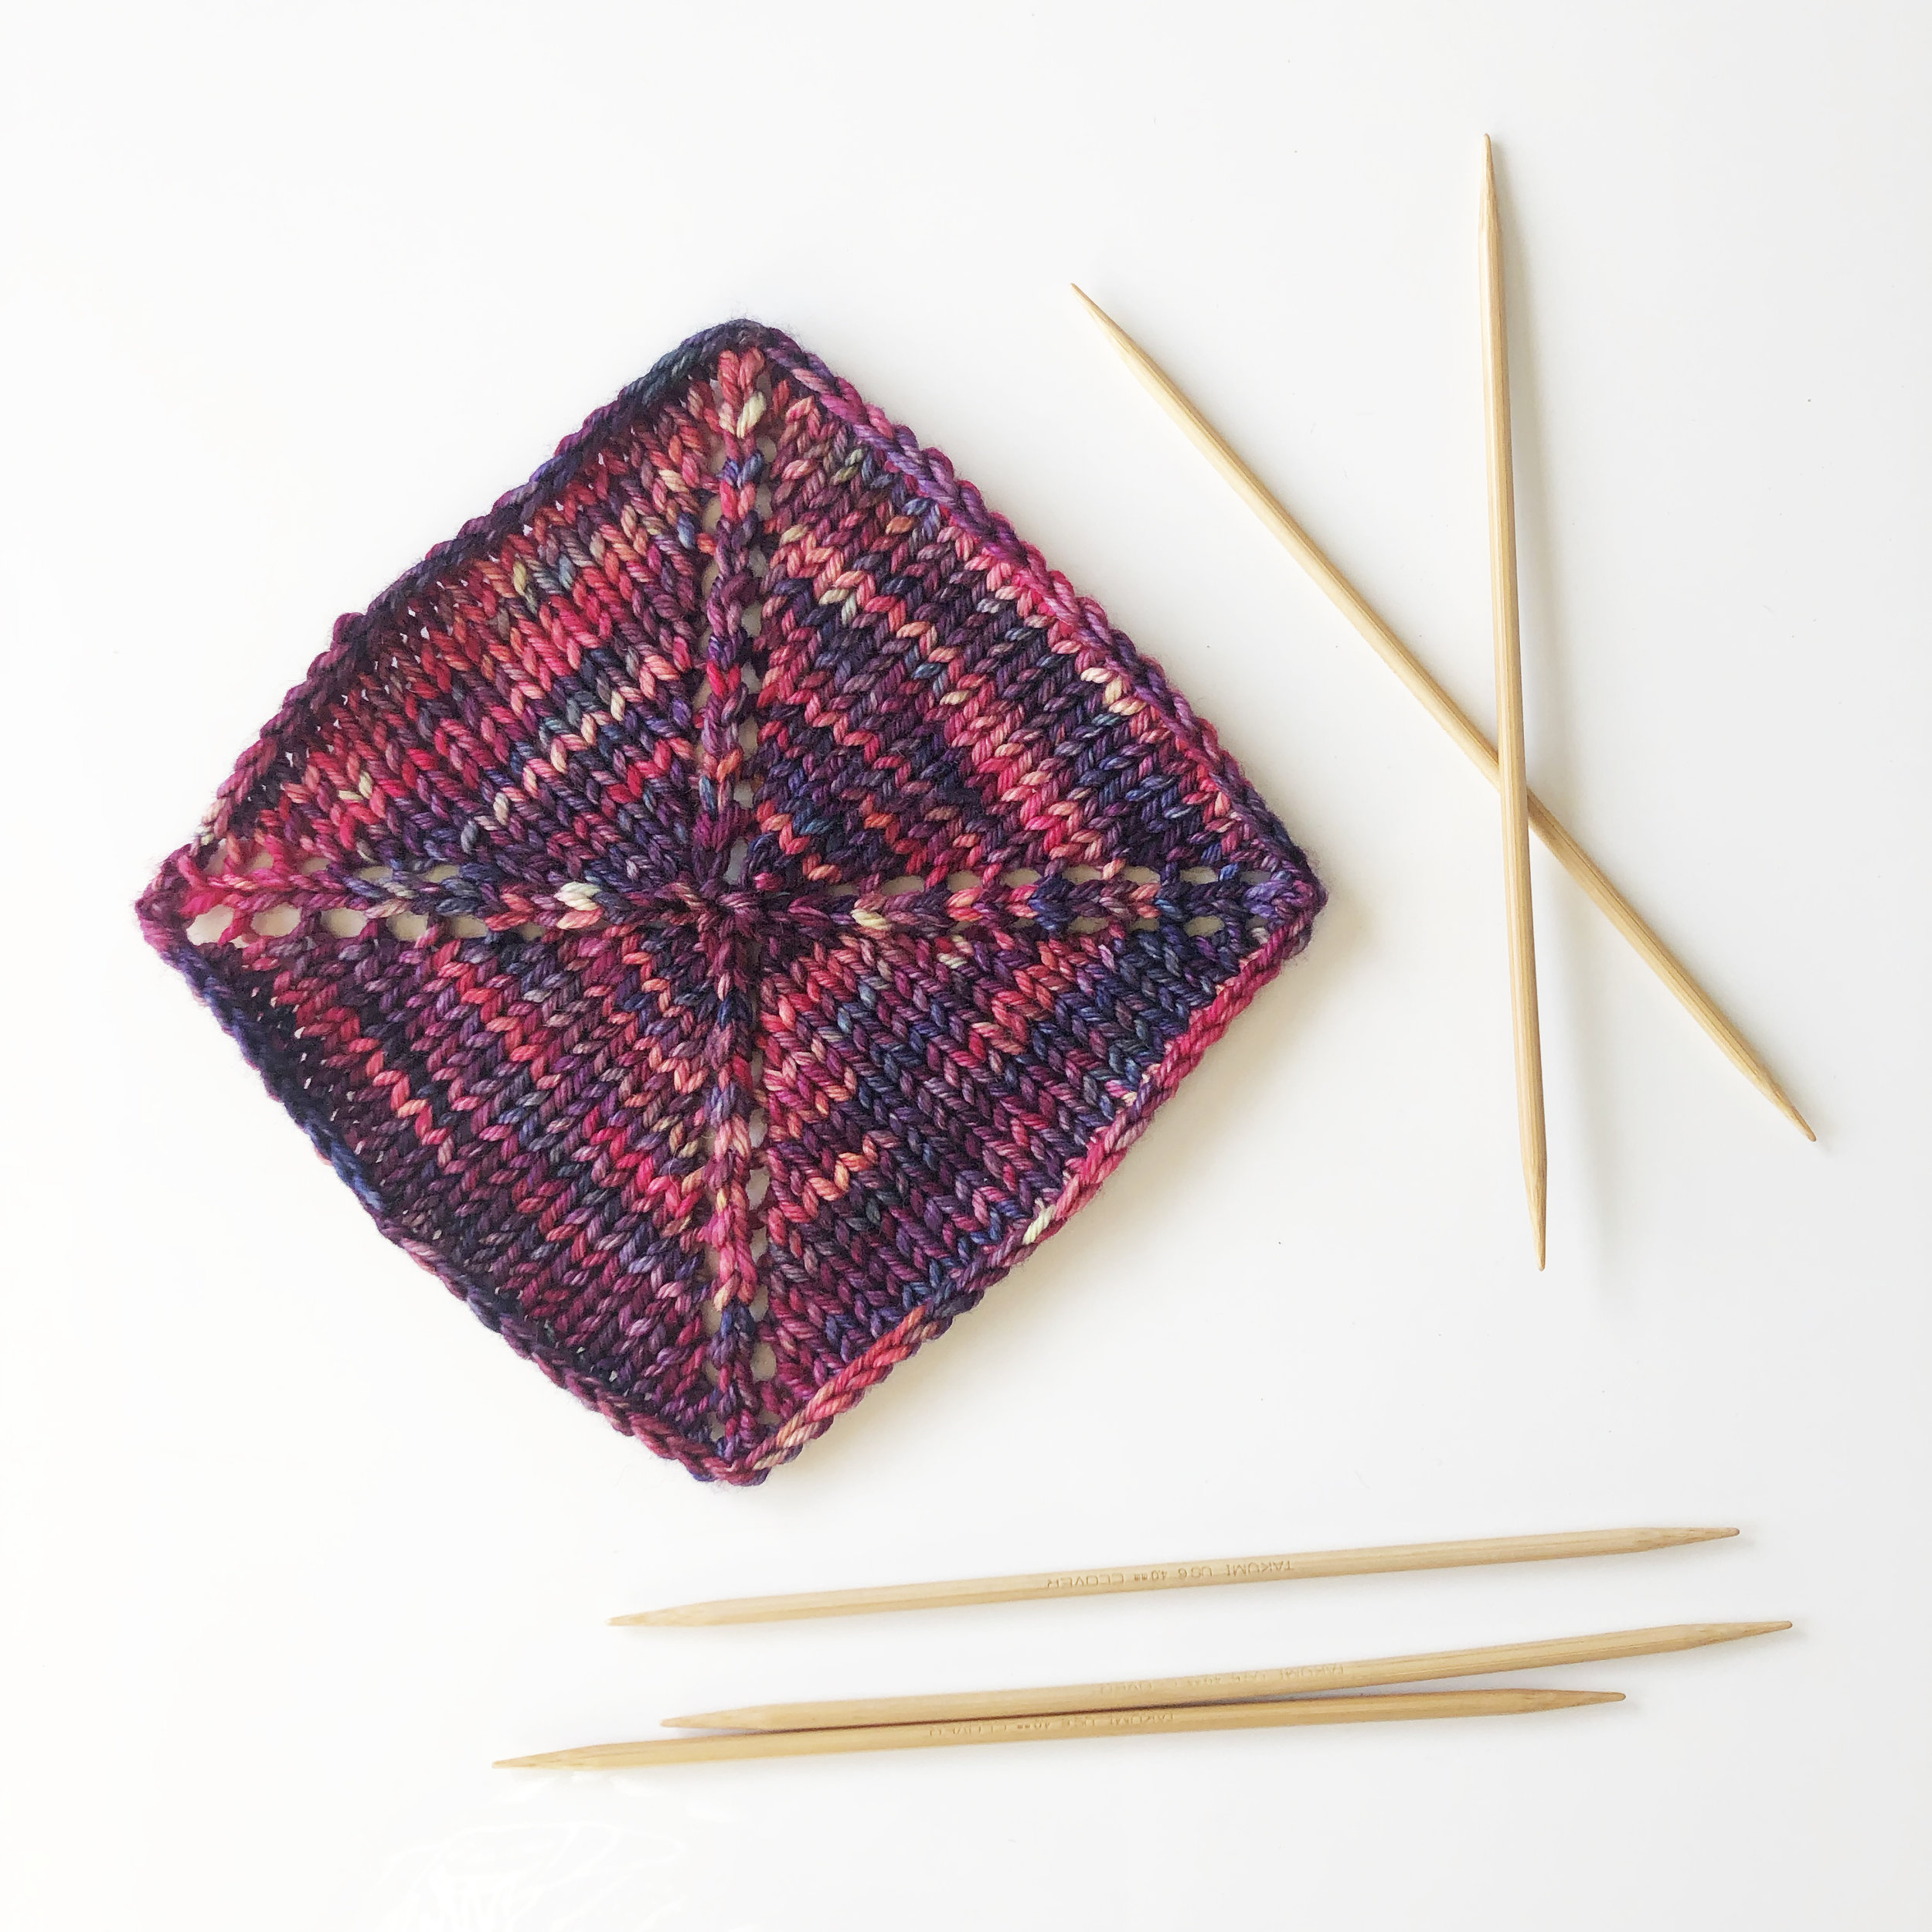 aroha-knits-5-shawls-5-days-challenge-the-square-shawl-knitting-elisemade-malabrigo-rios